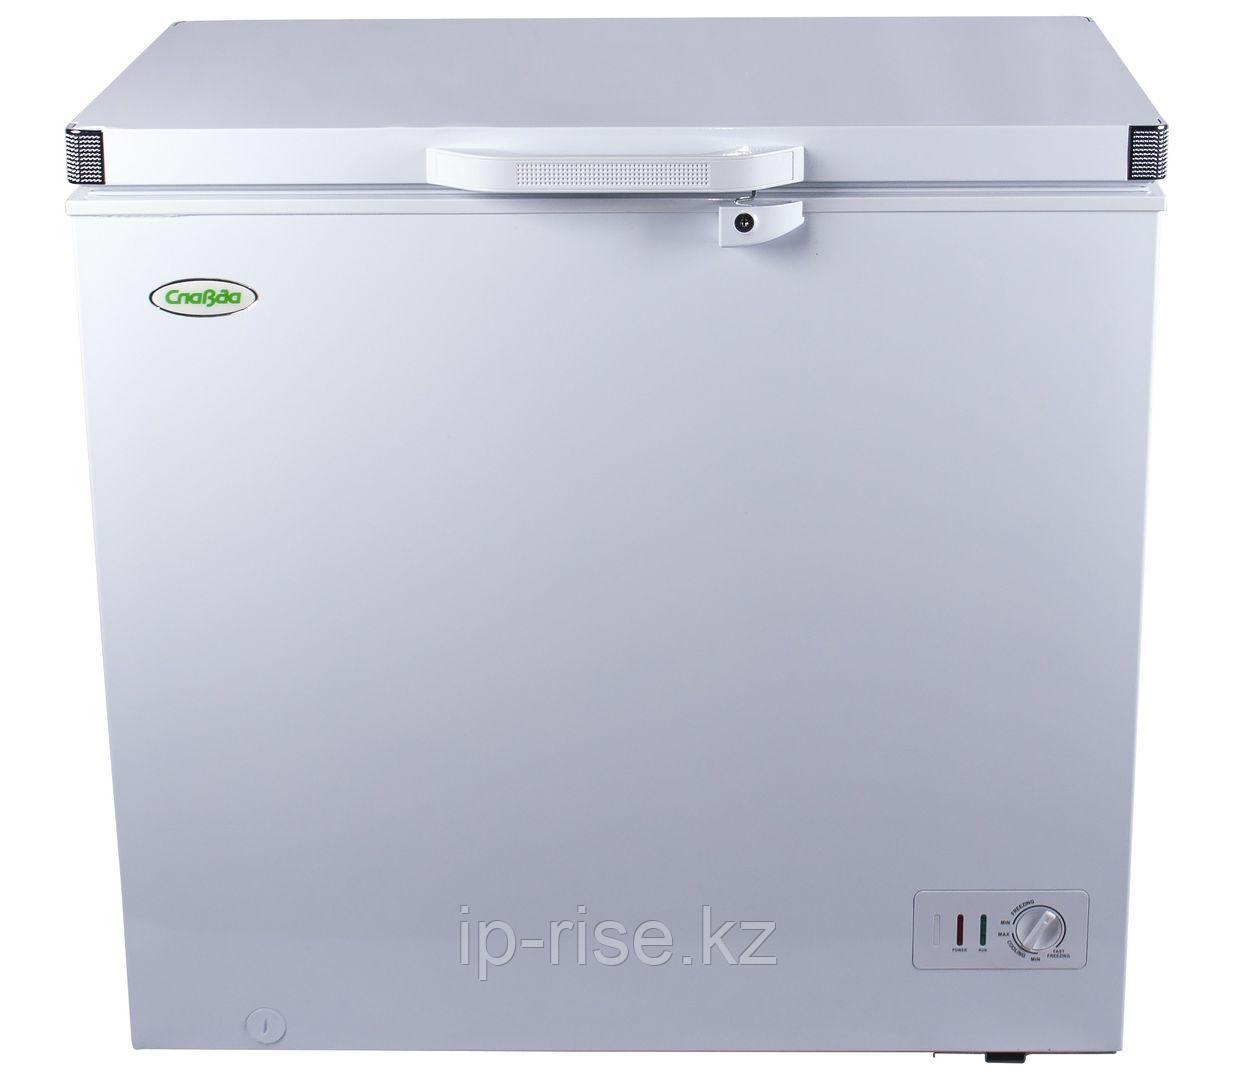 Славда FC-235C морозильная камера